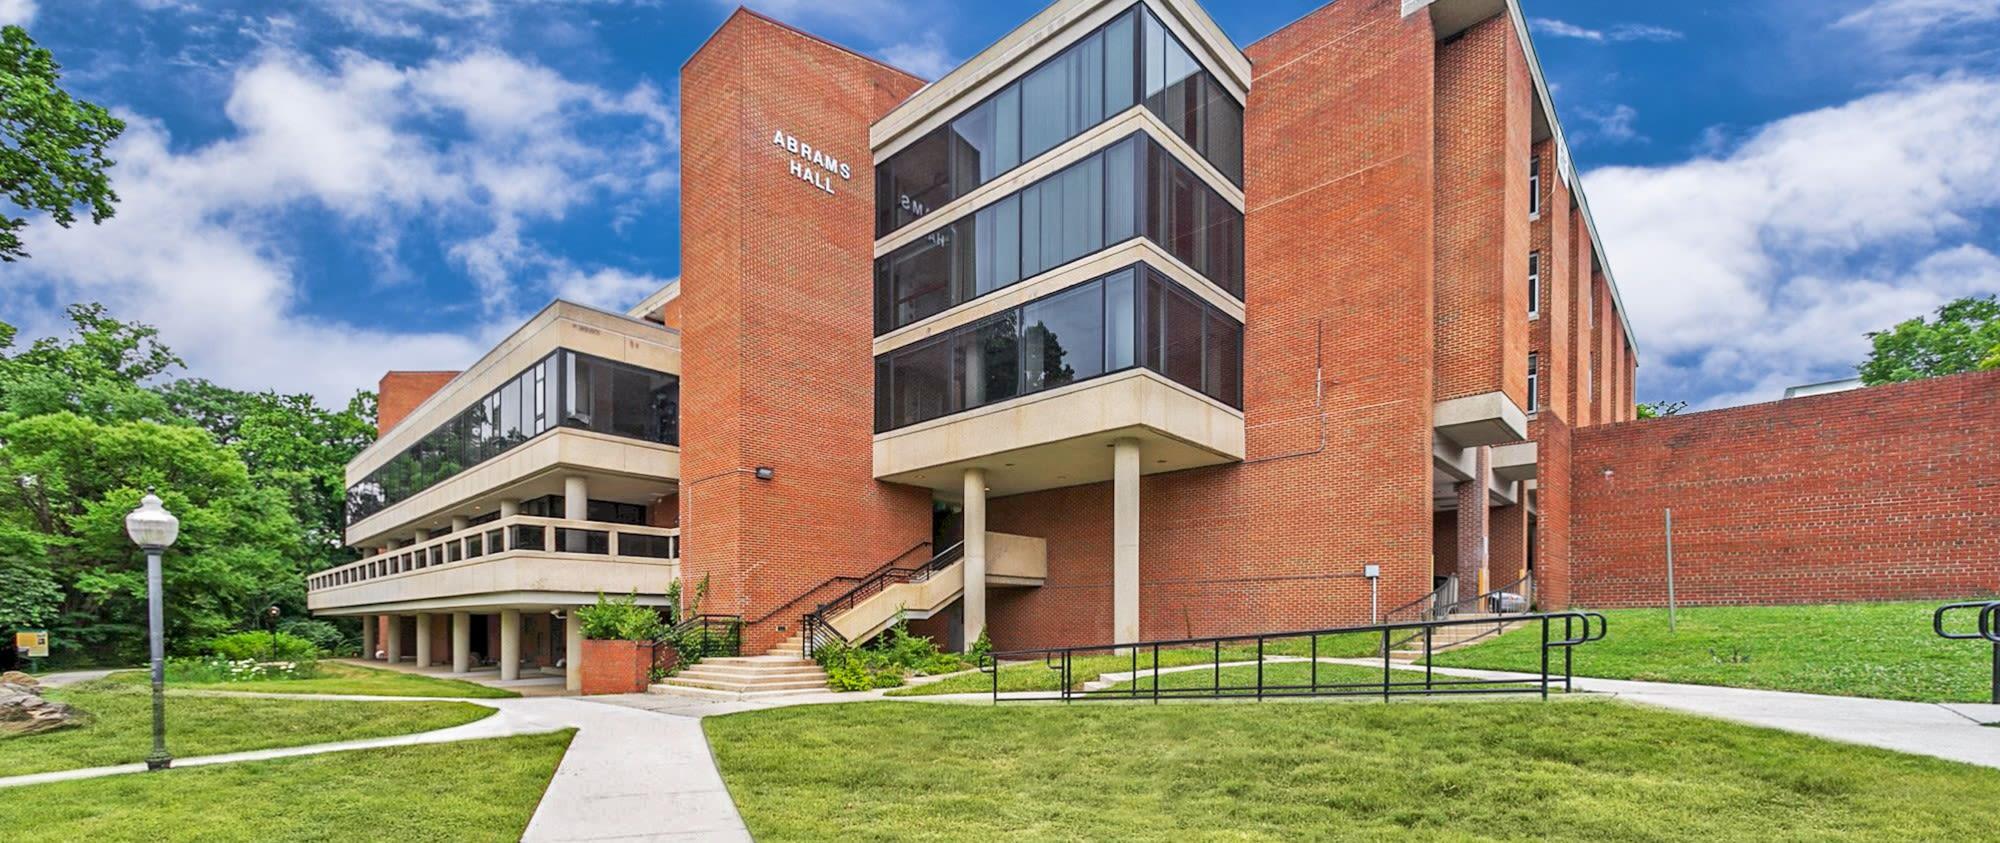 Abrams Hall Senior Apartments in Washington, District of Columbia